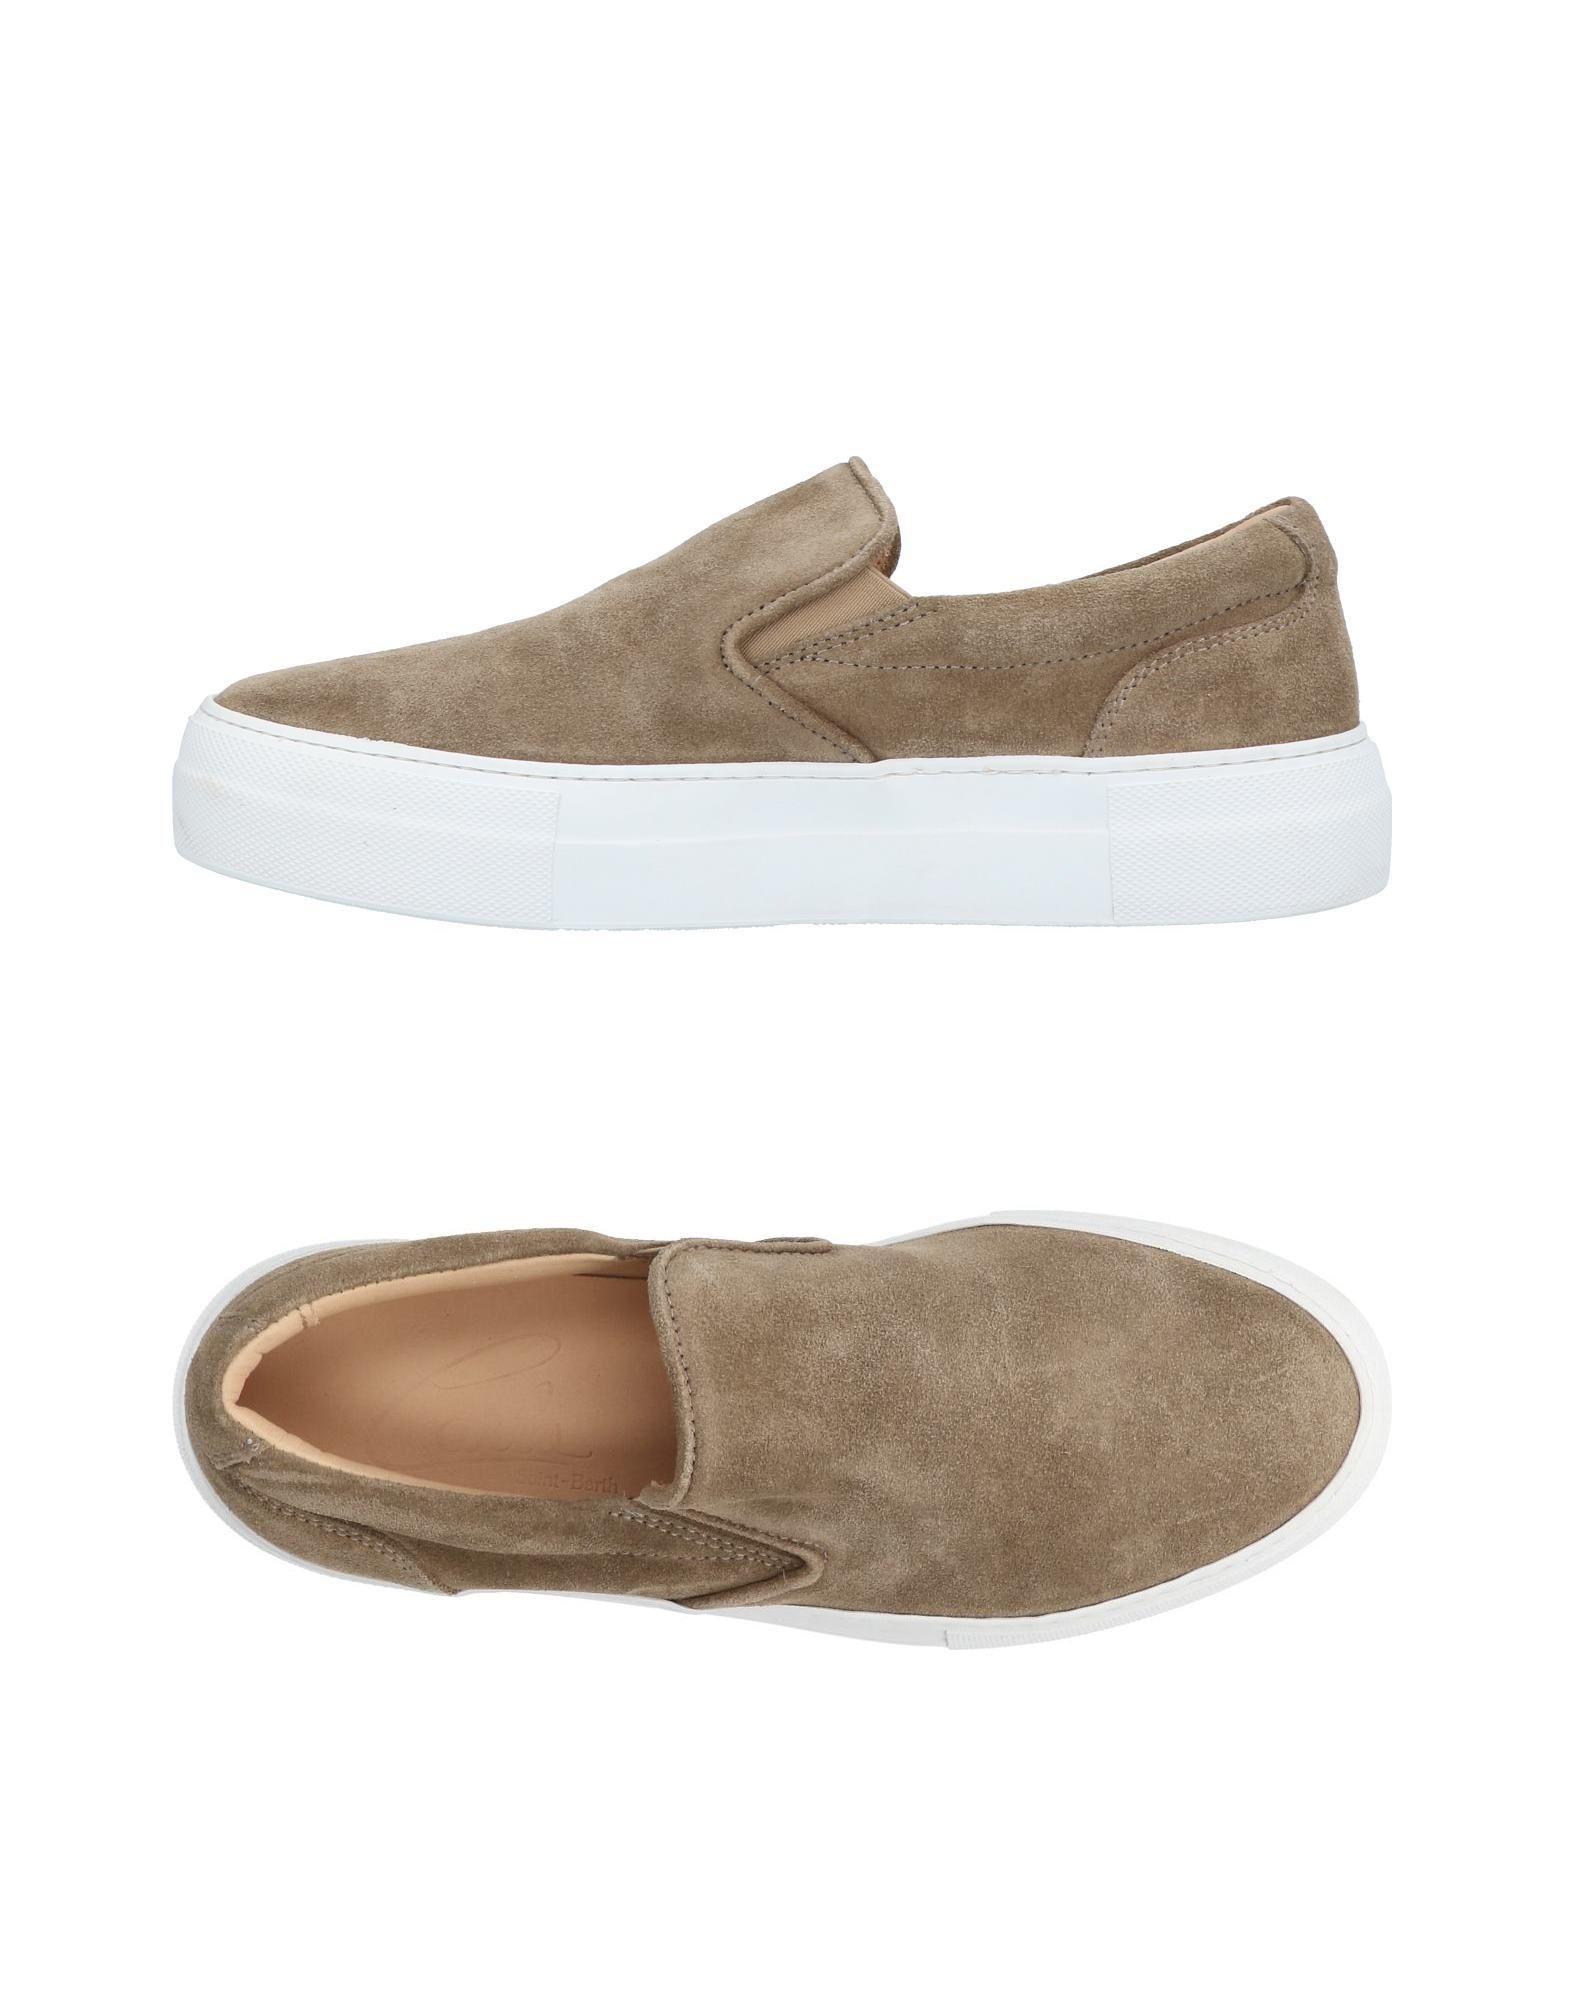 FOOTWEAR - Low-tops & sneakers Carla Saint Barth 8hEU4mD8LG